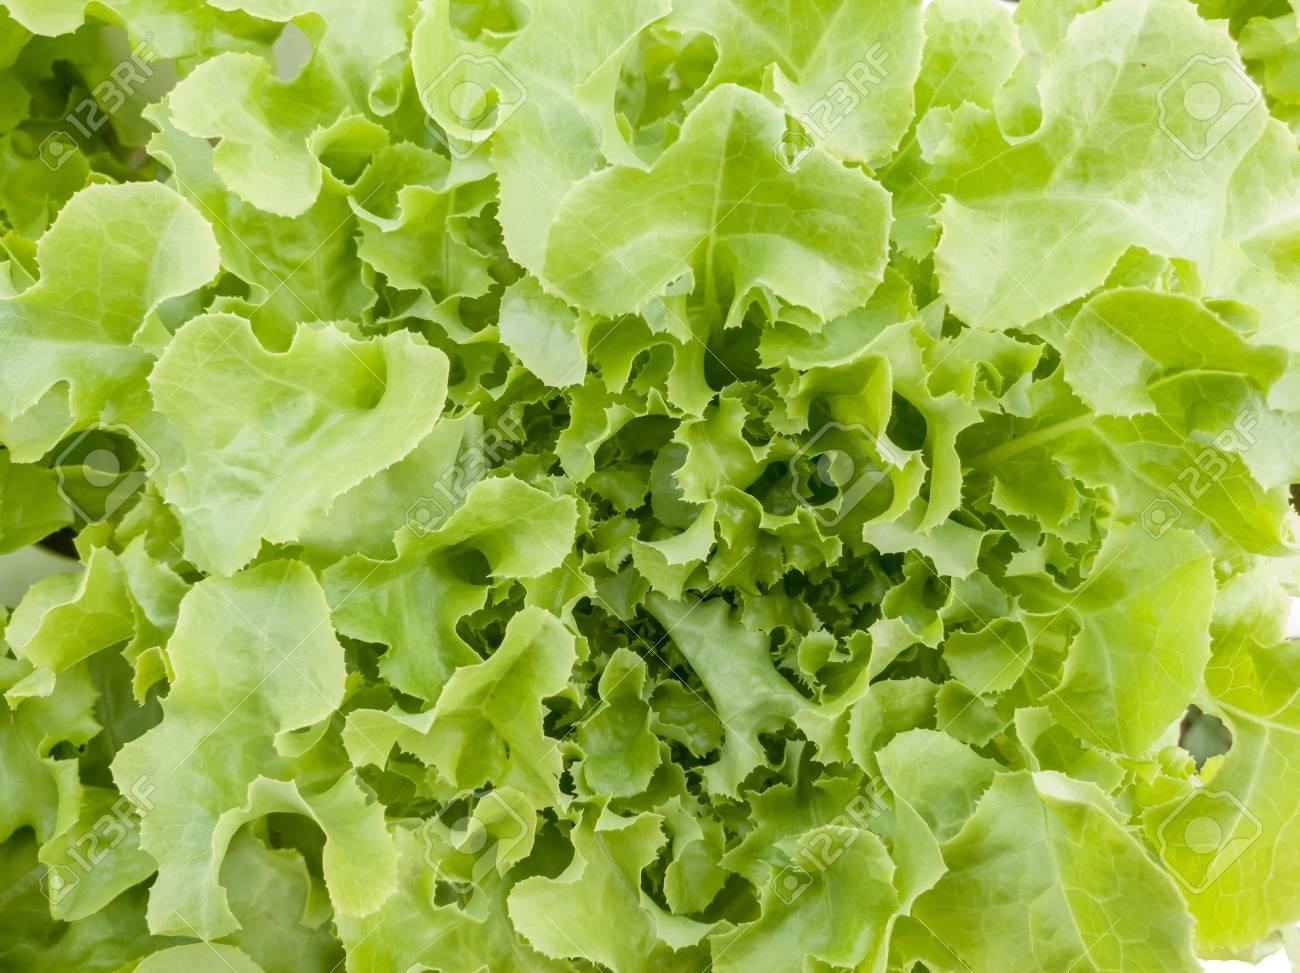 Salad vegetable green fresh lettuce in farm close up - 106236403